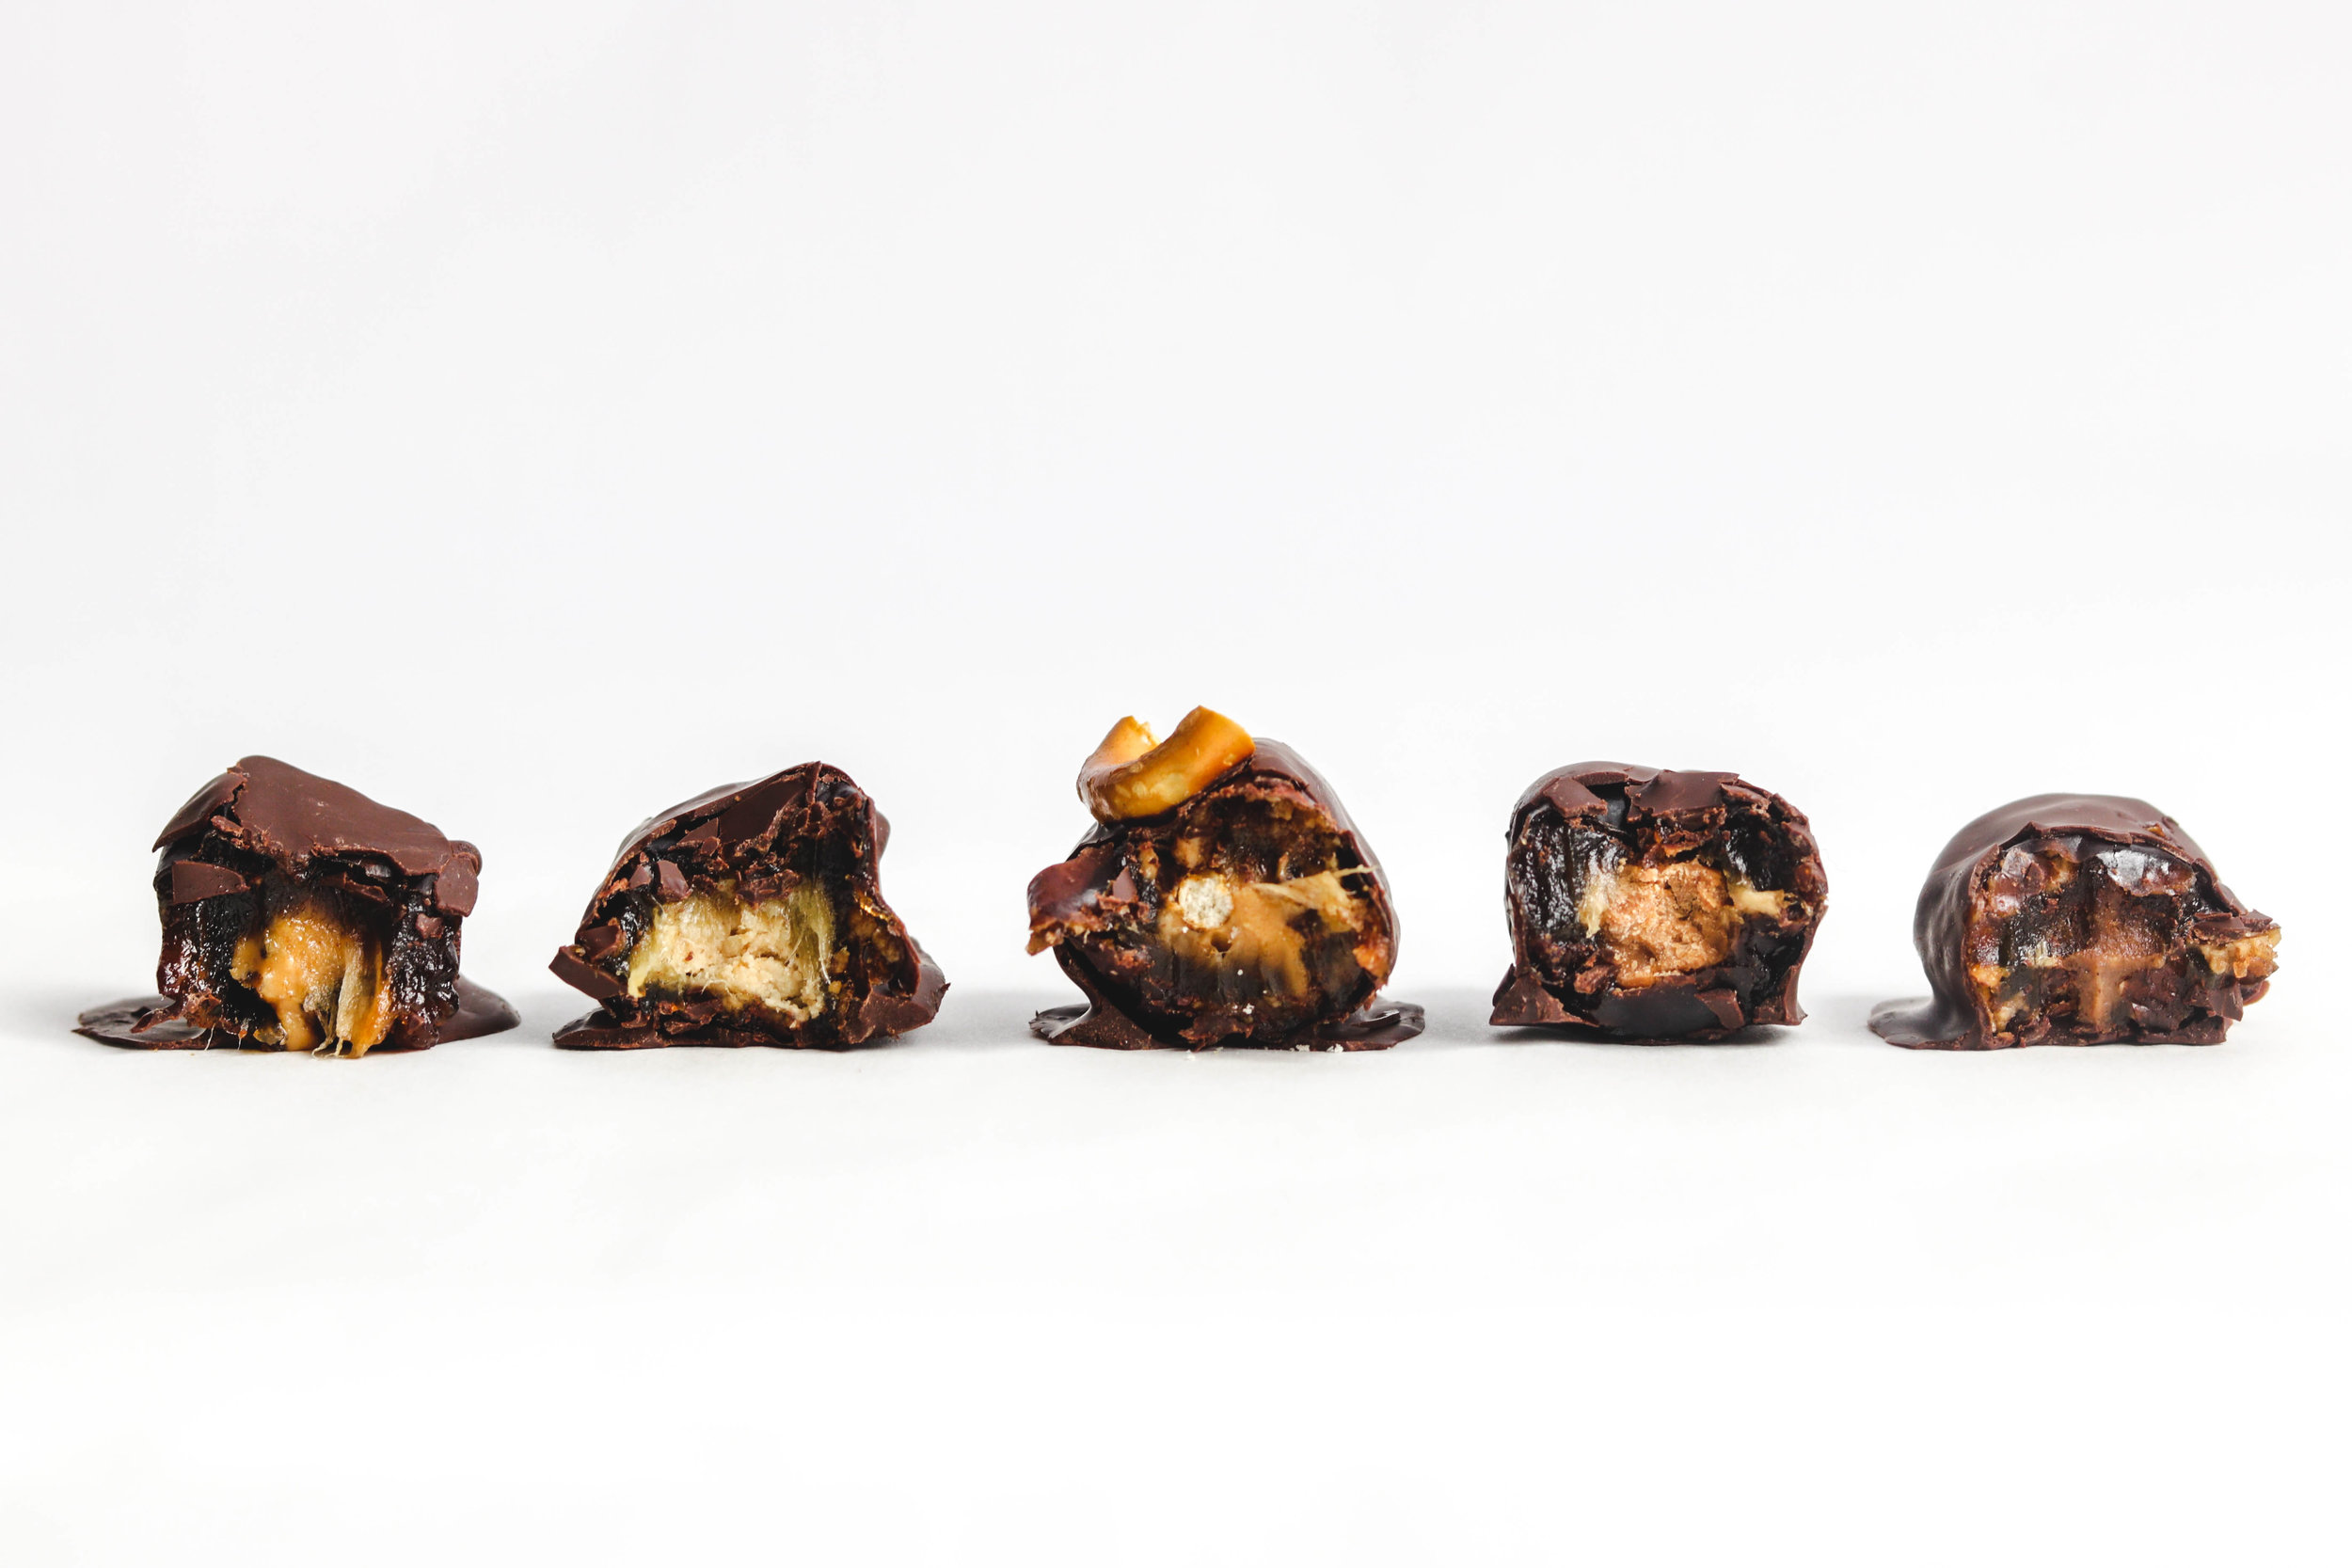 Chcolate Covered Stuffed Dates-10.jpg